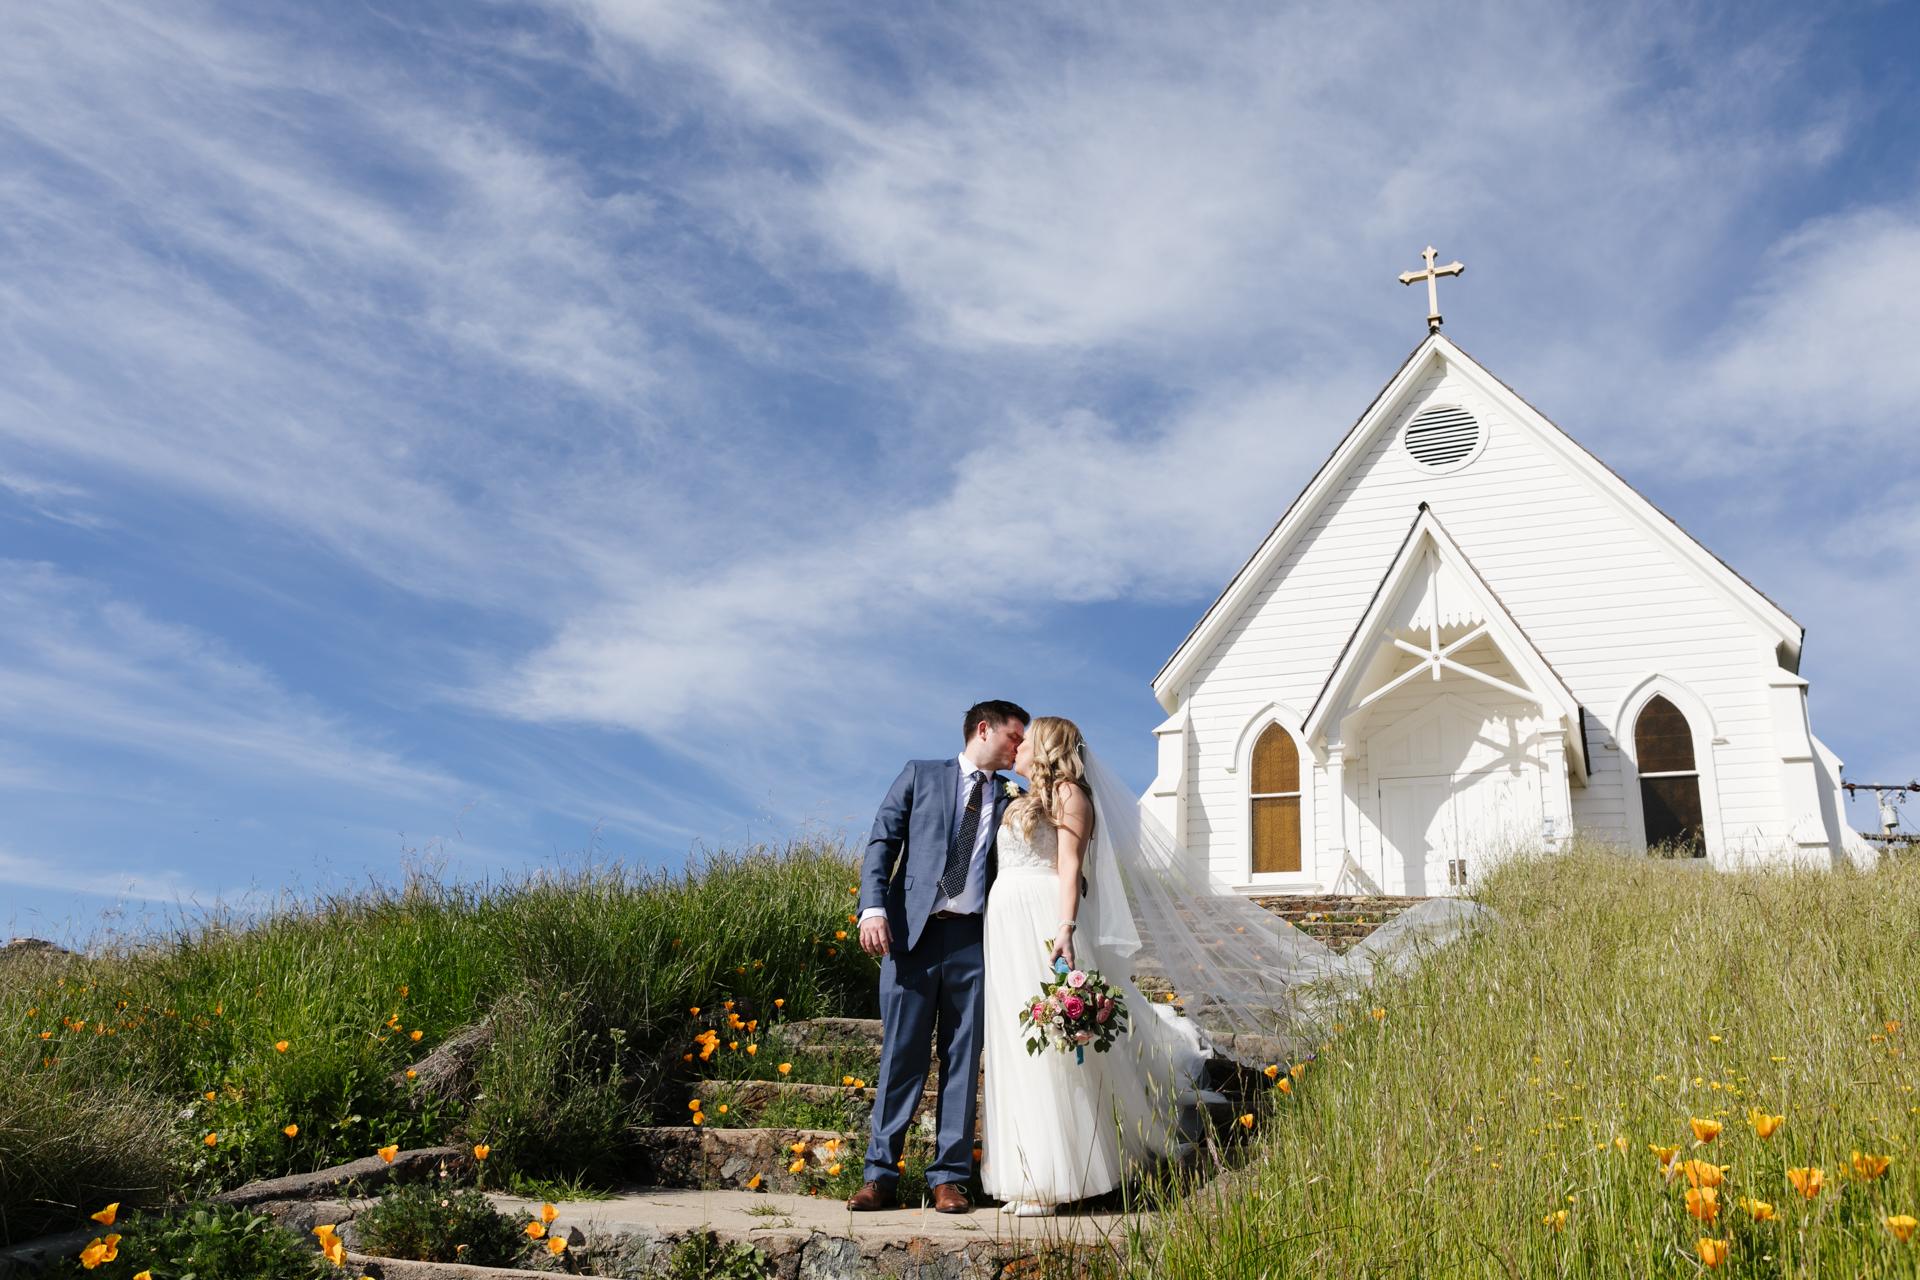 KBWeddings_MeaghanMark_WeddingPreview_B4_9696.jpg